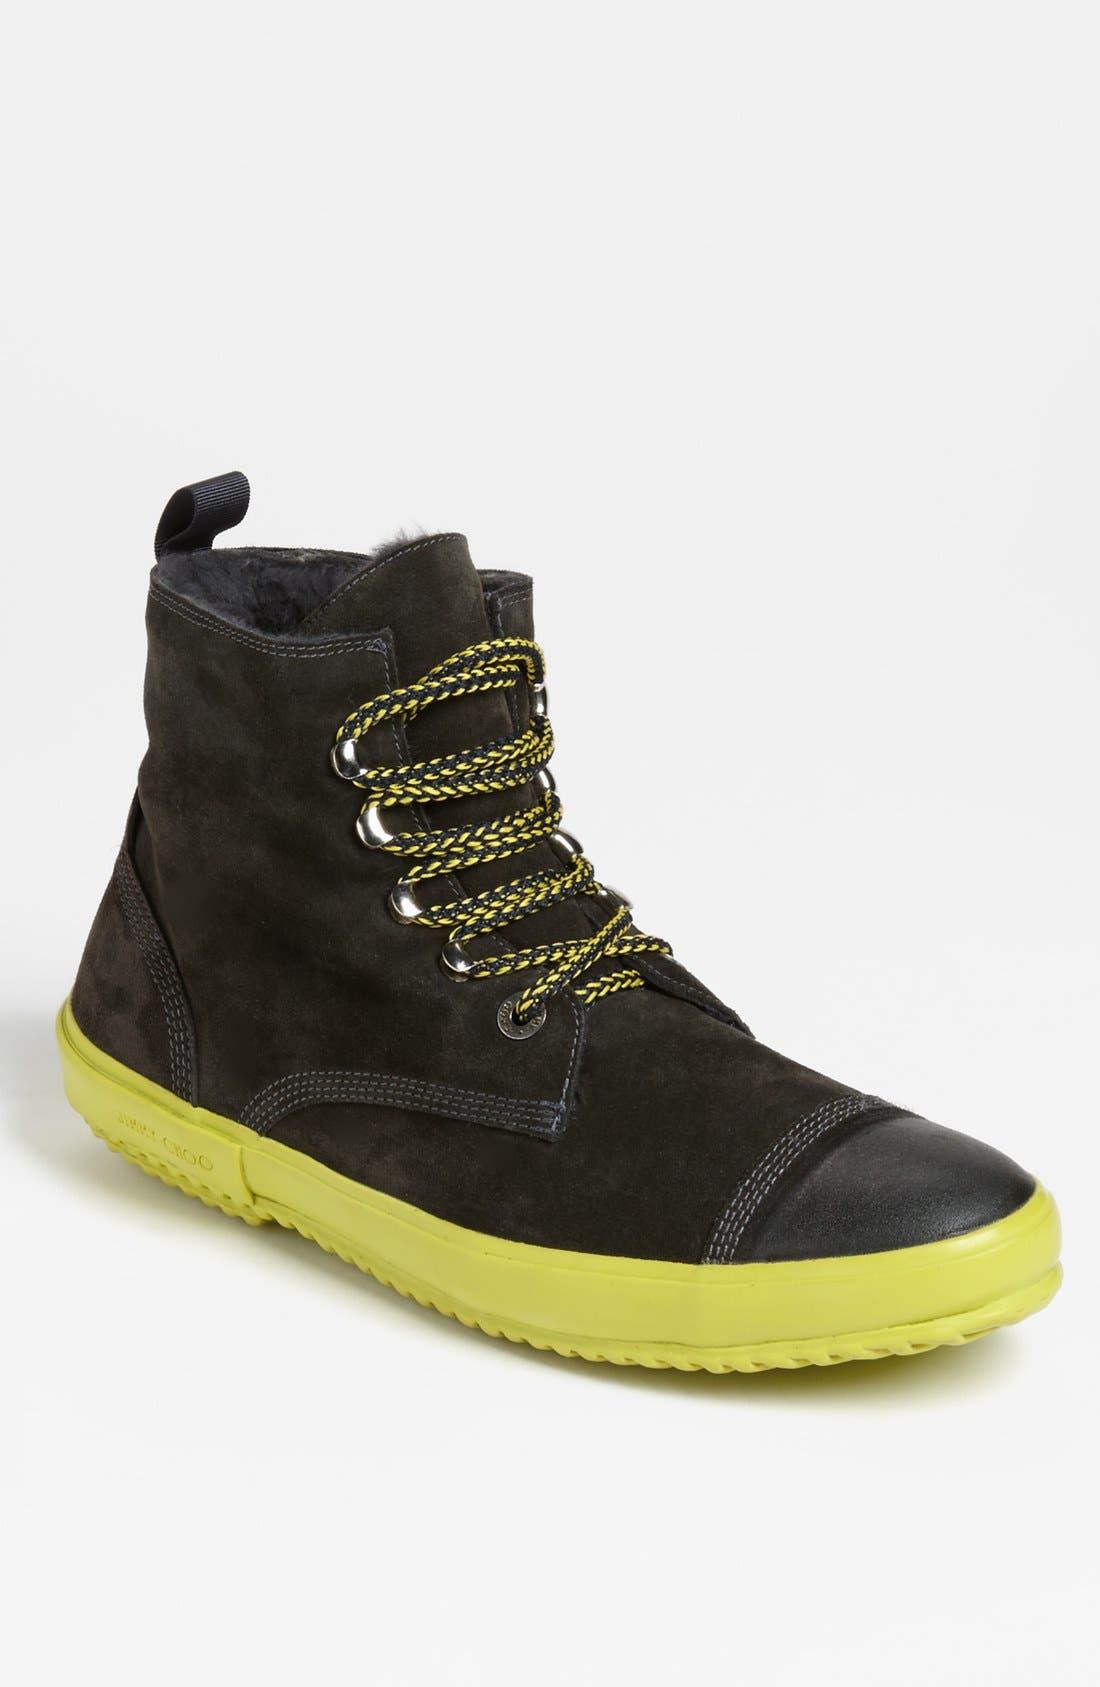 Alternate Image 1 Selected - Jimmy Choo 'Cabot' Sneaker